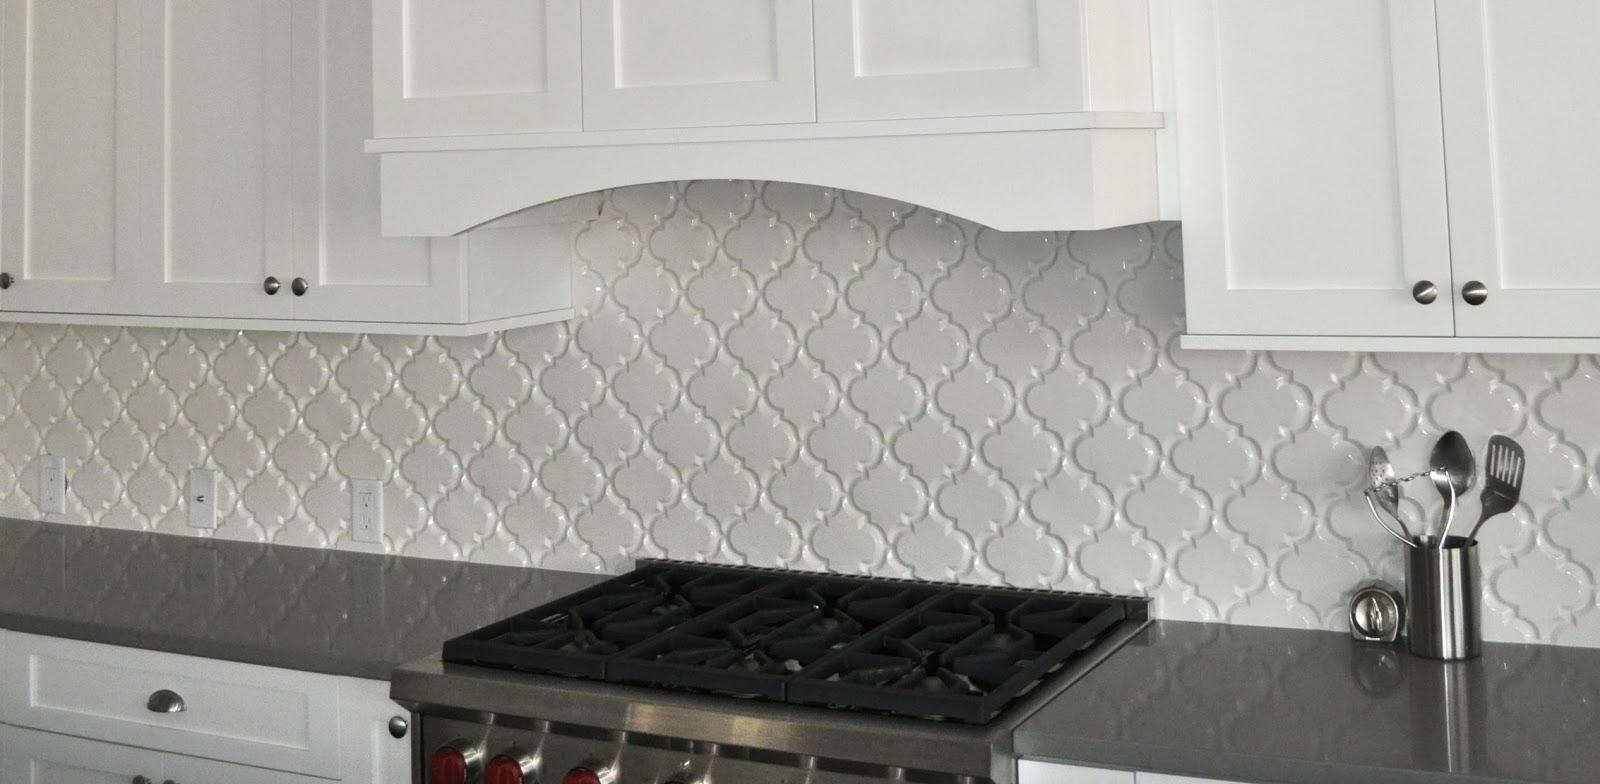 Our new place january 2014 for Beveled arabesque tile backsplash